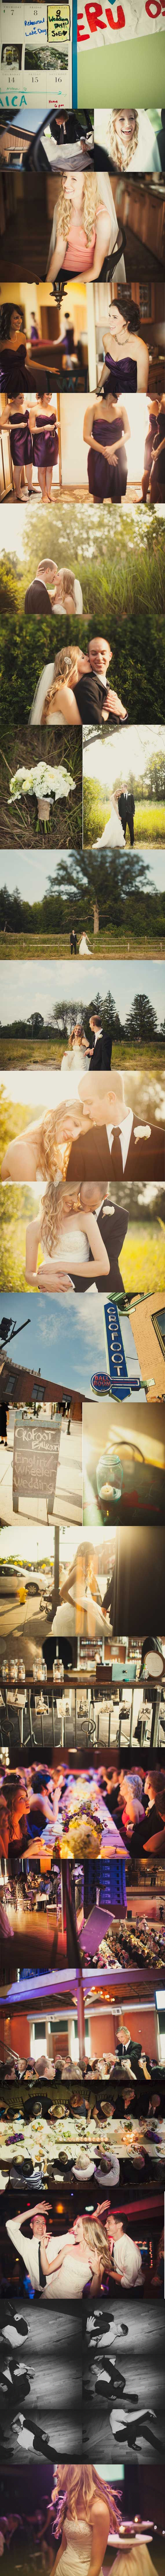 Thomas knoell wedding